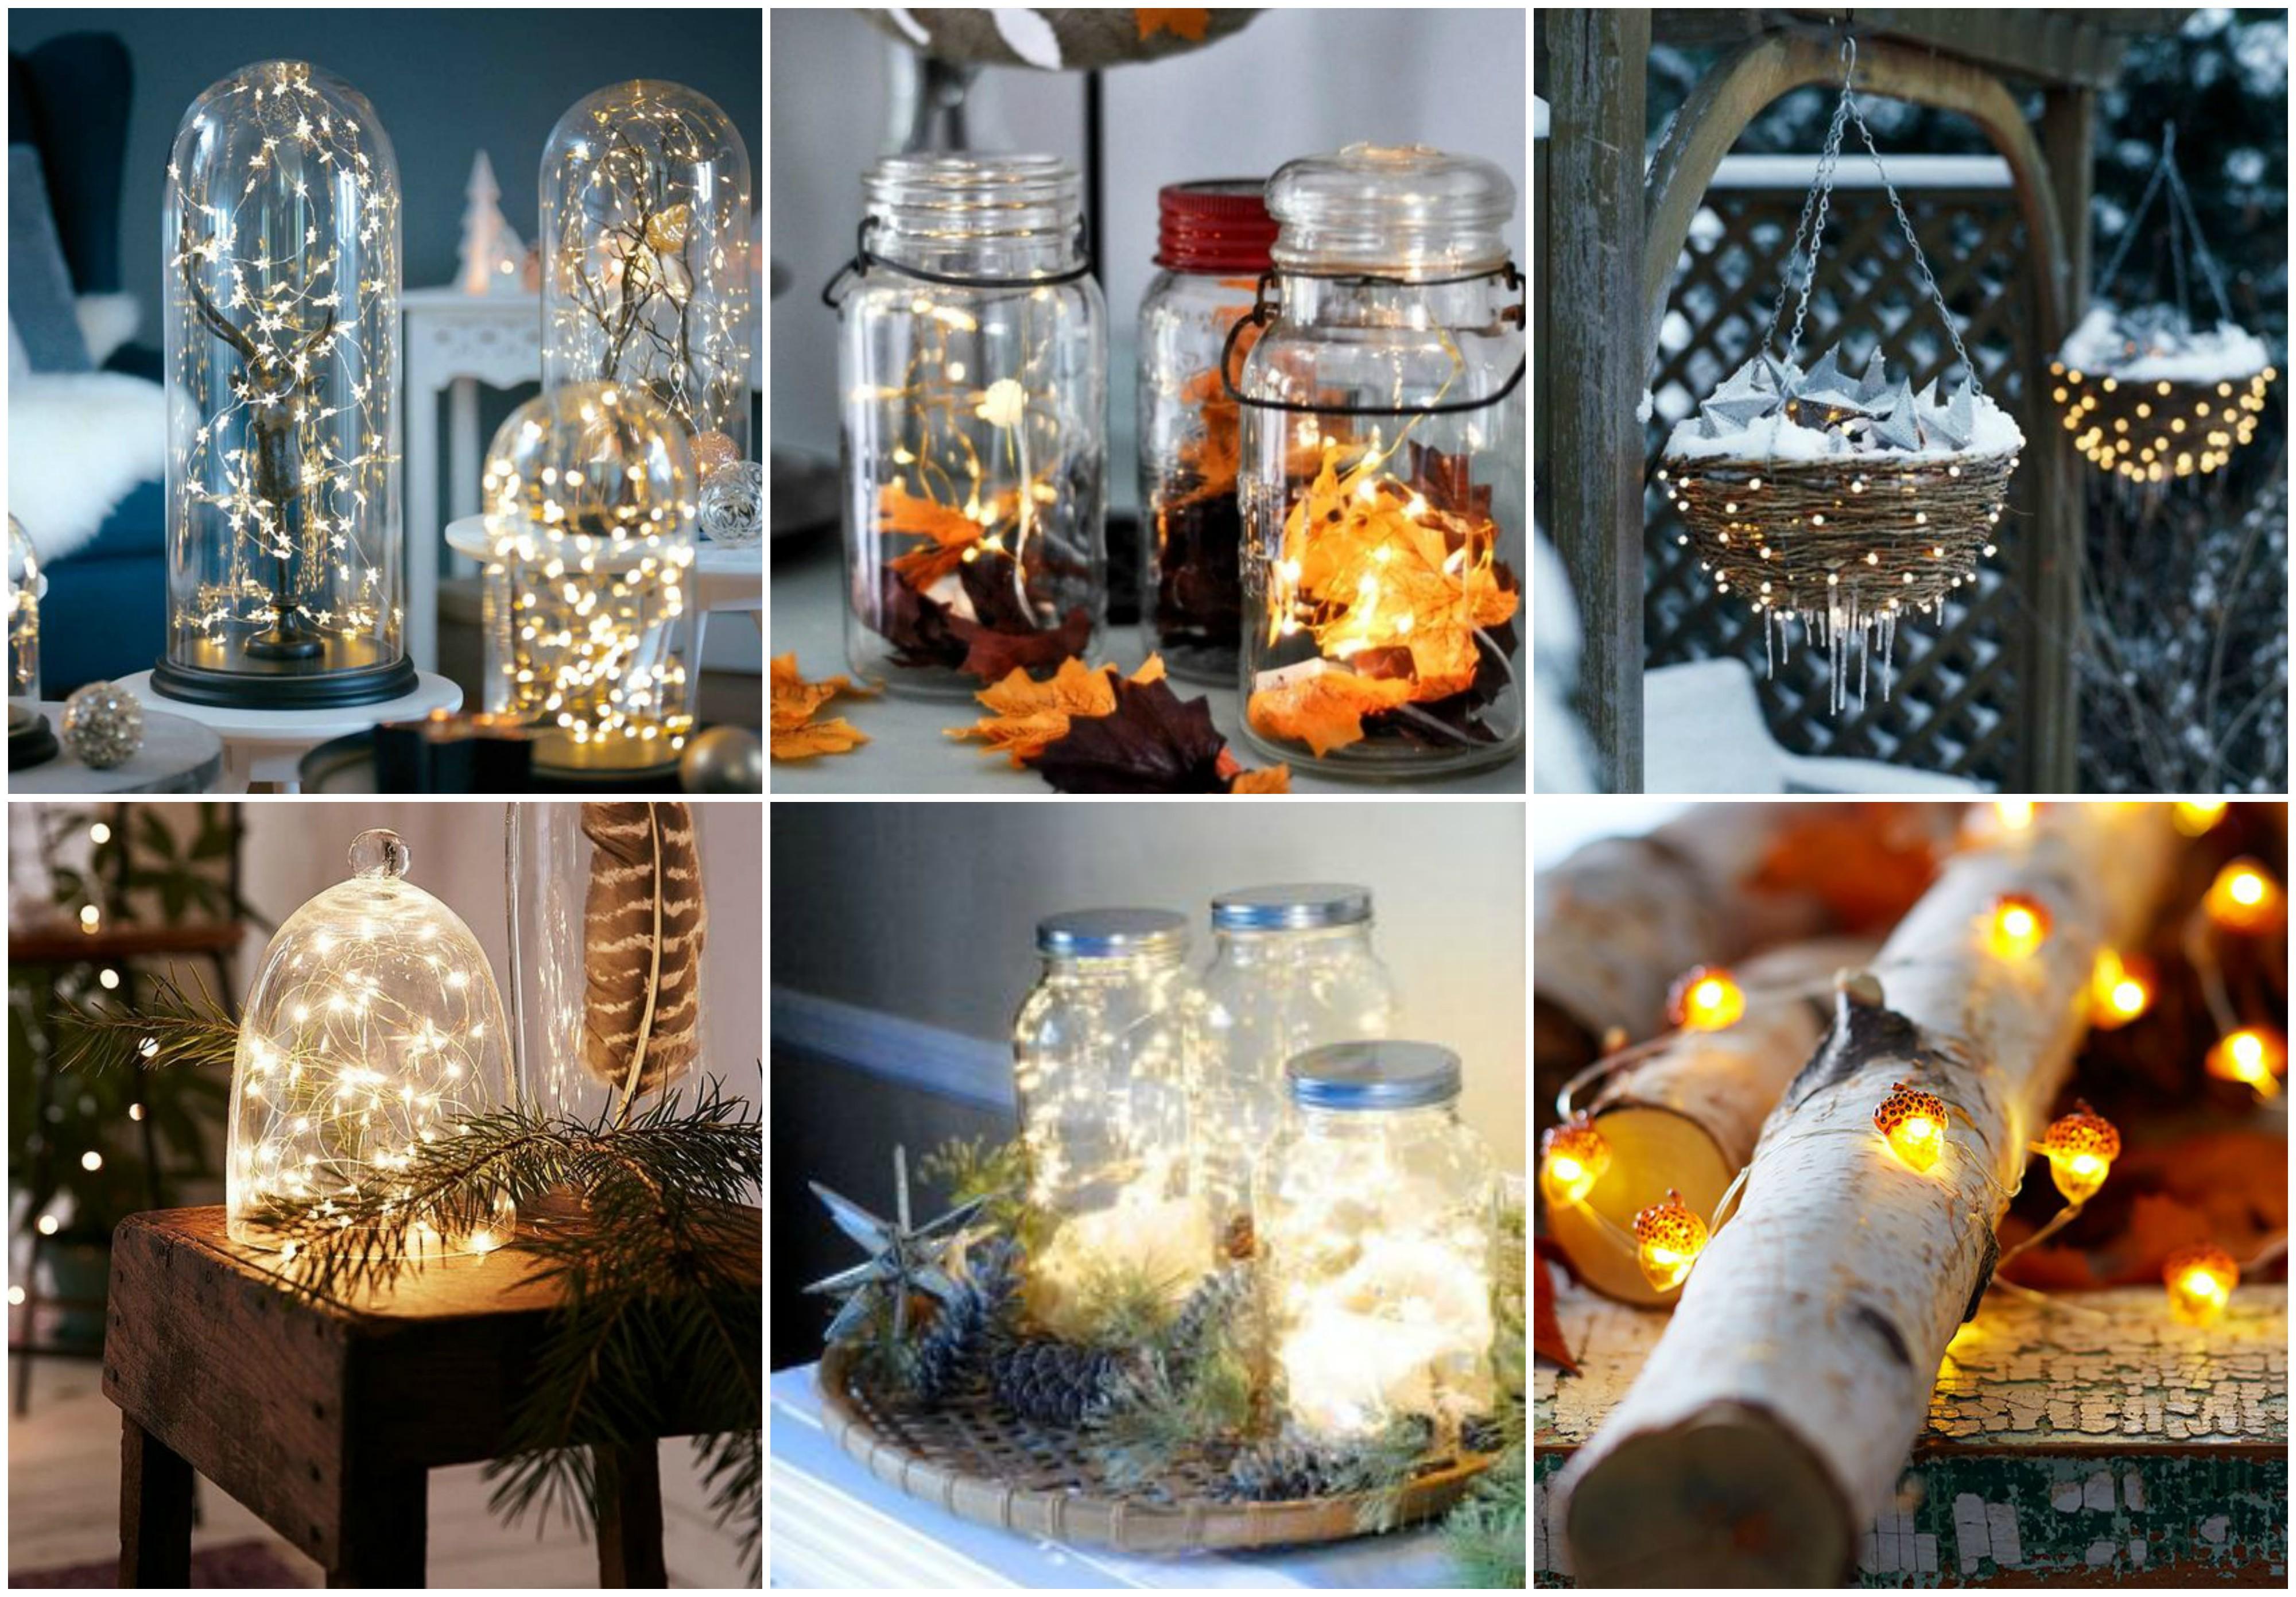 winterliche beleuchtungsideen f r eure wohnung. Black Bedroom Furniture Sets. Home Design Ideas